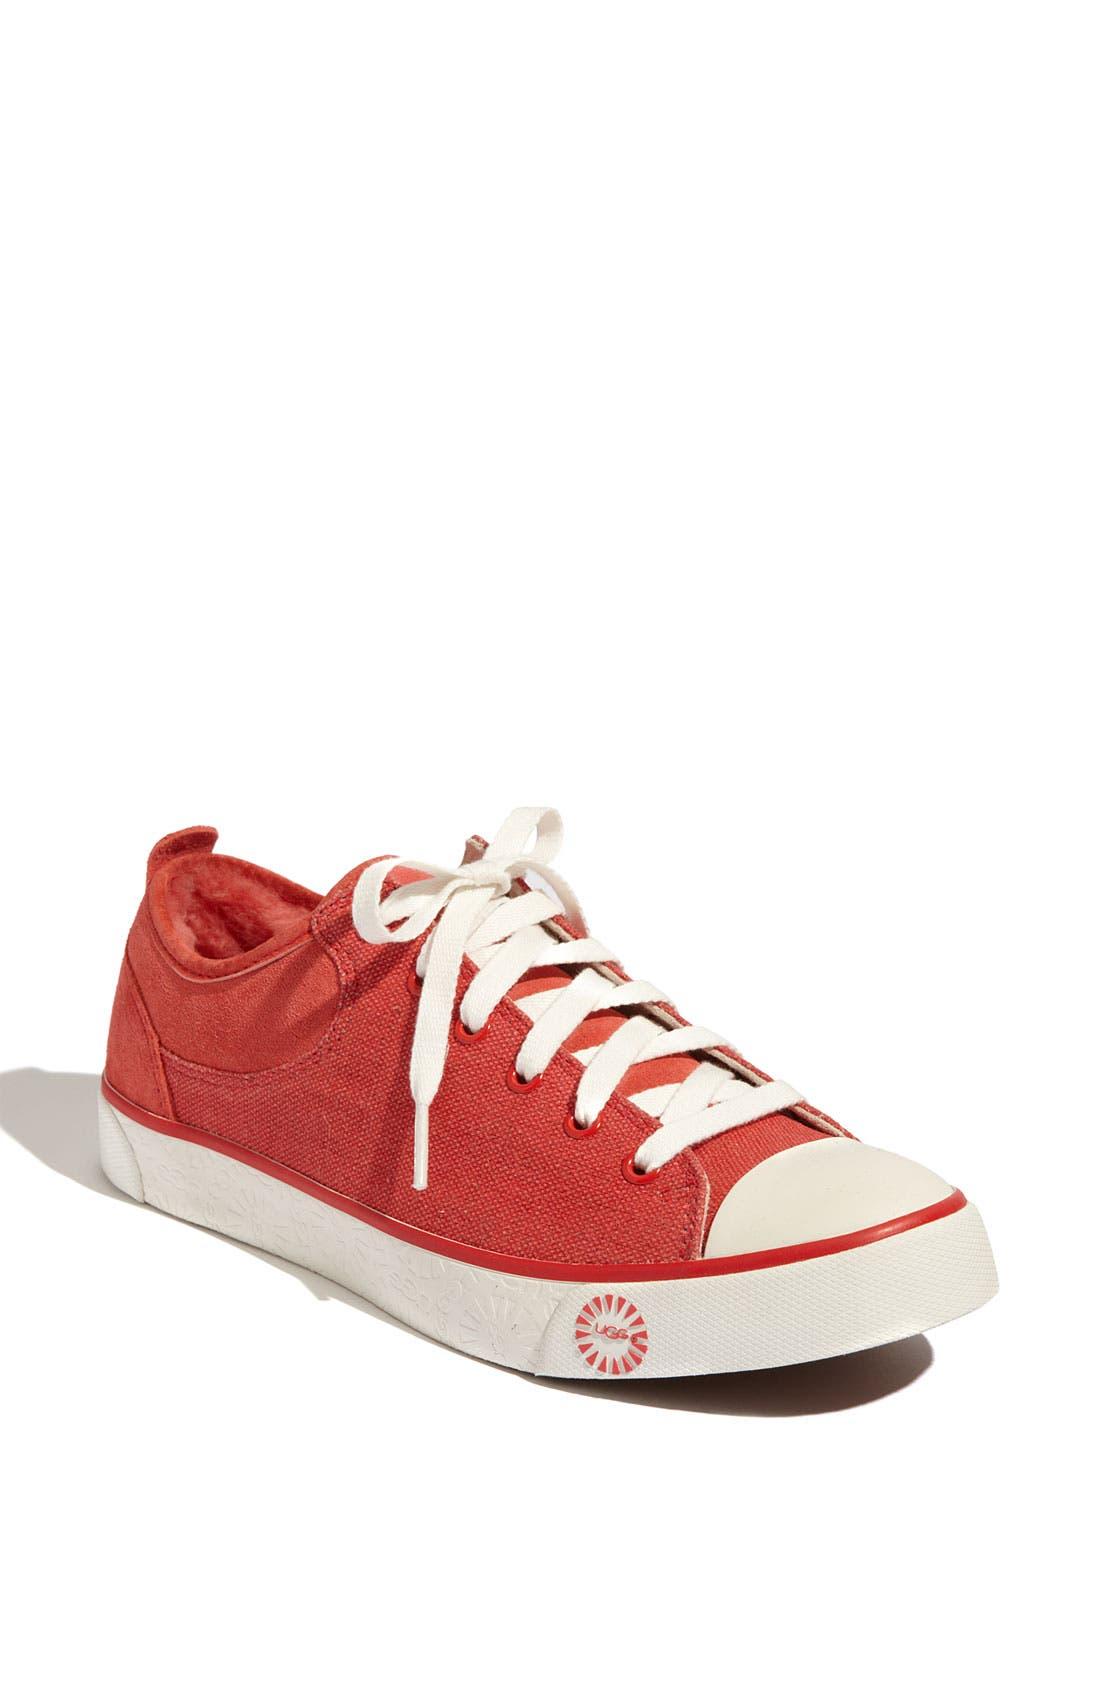 Main Image - UGG® Australia 'Evera' Sneaker (Women)